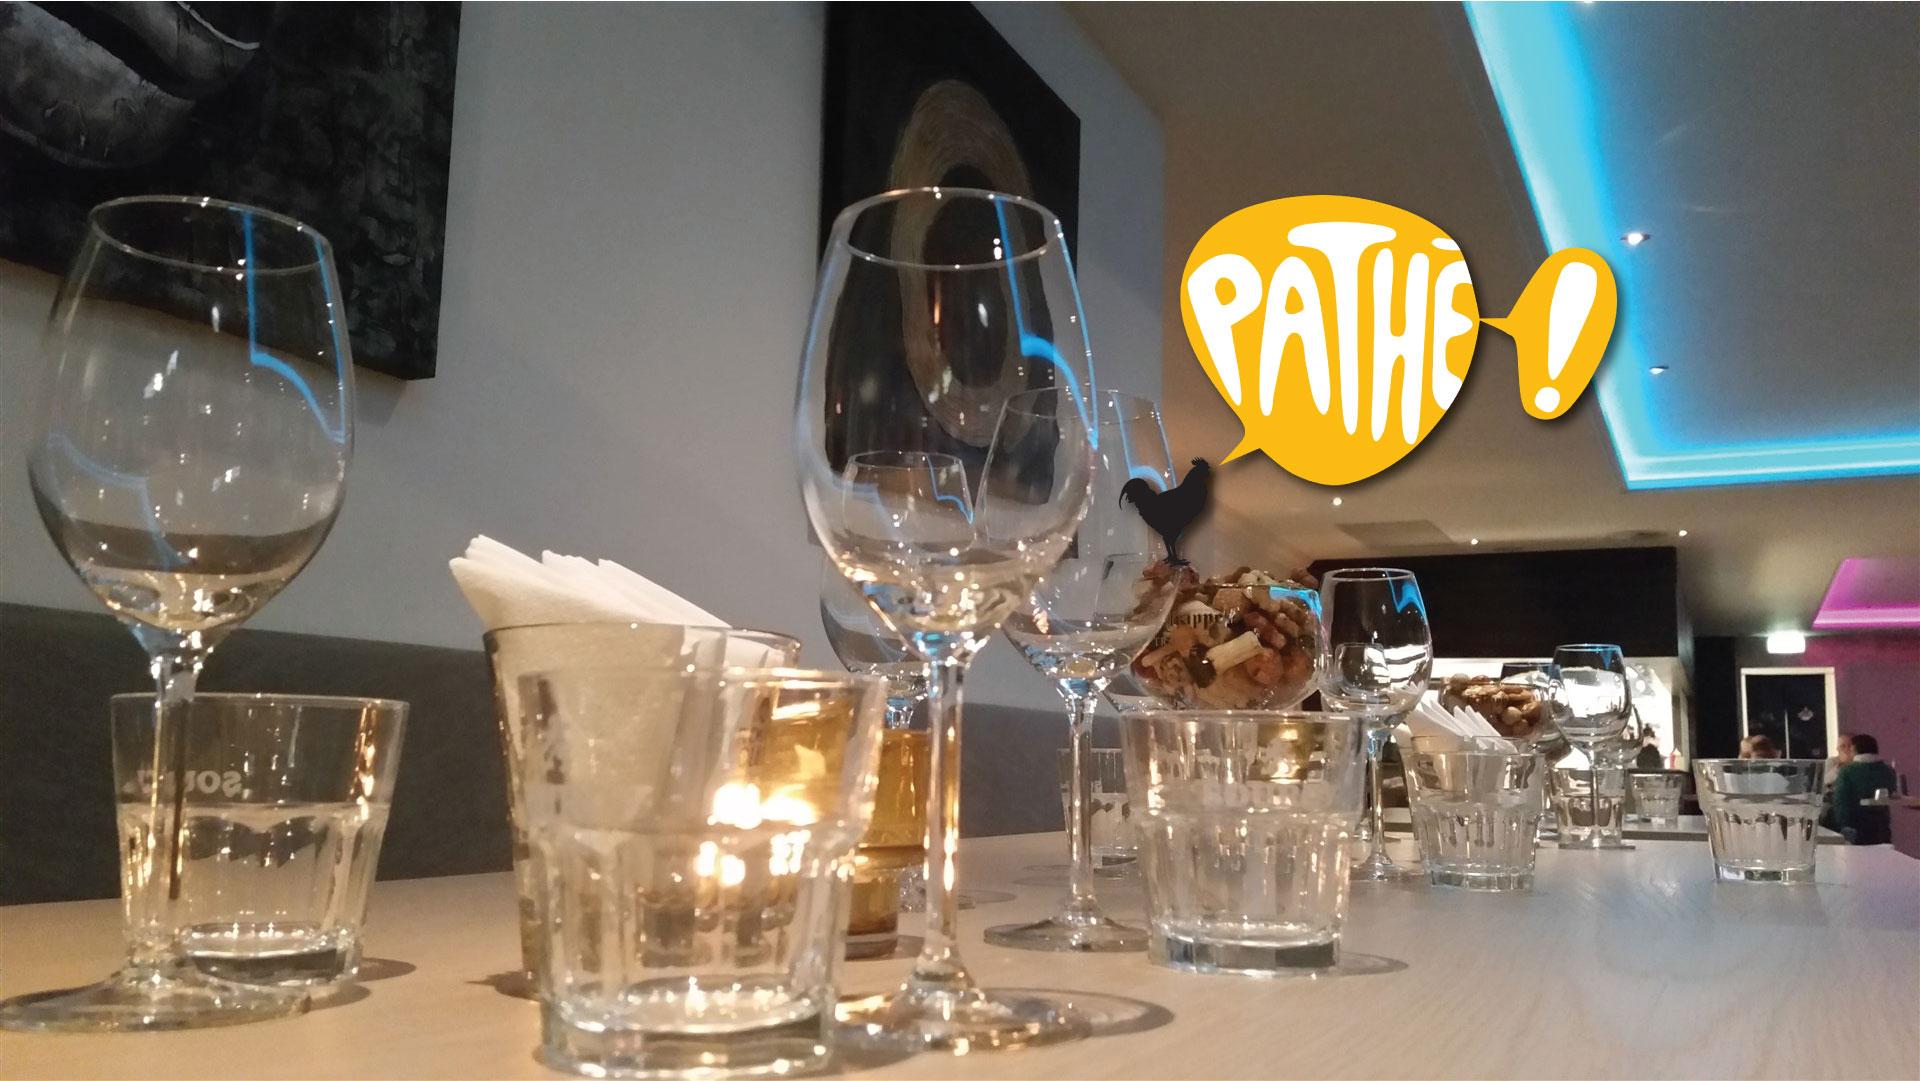 Pathefilm Diner